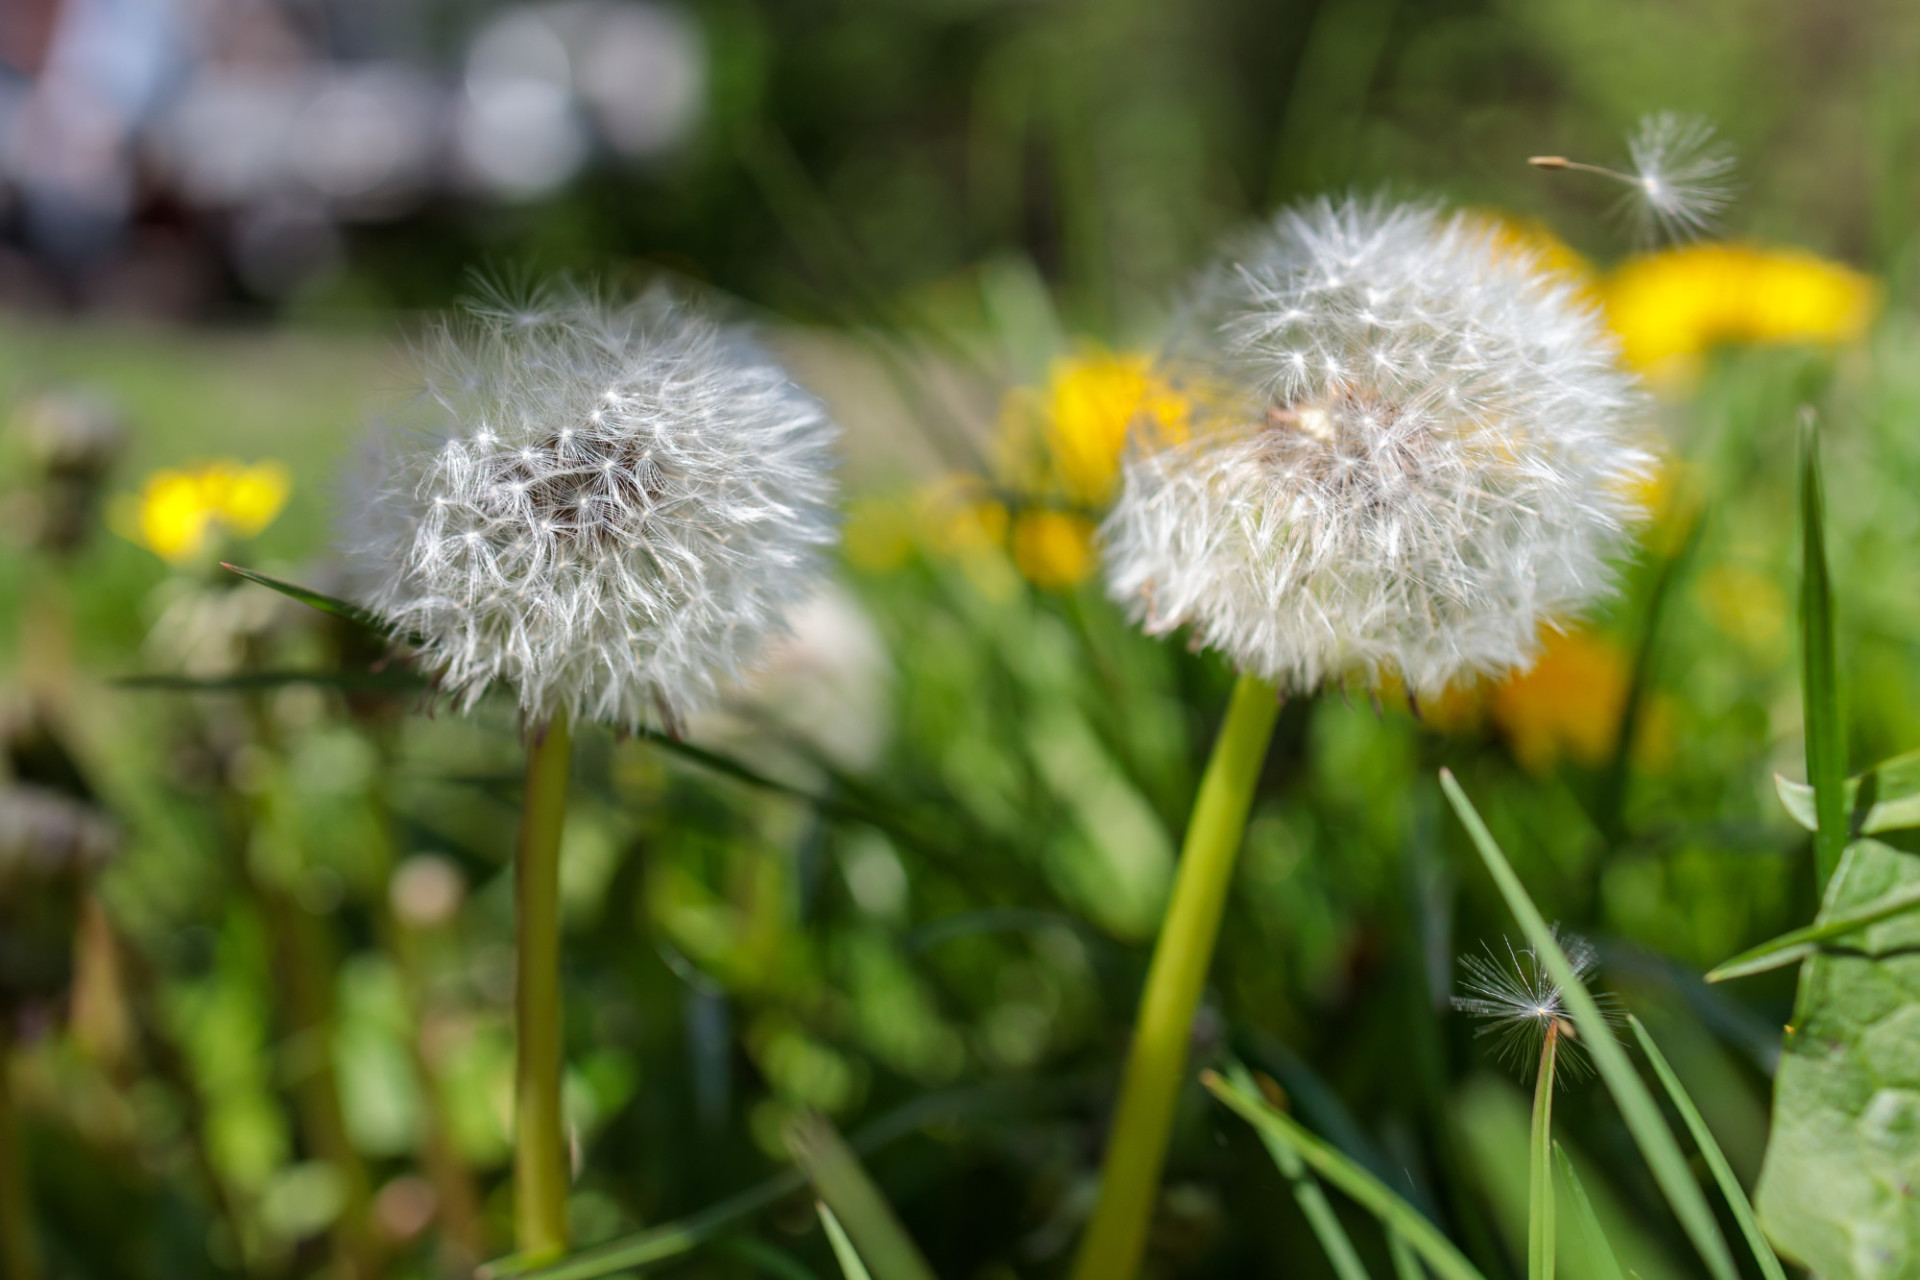 Two dandelions in the wind